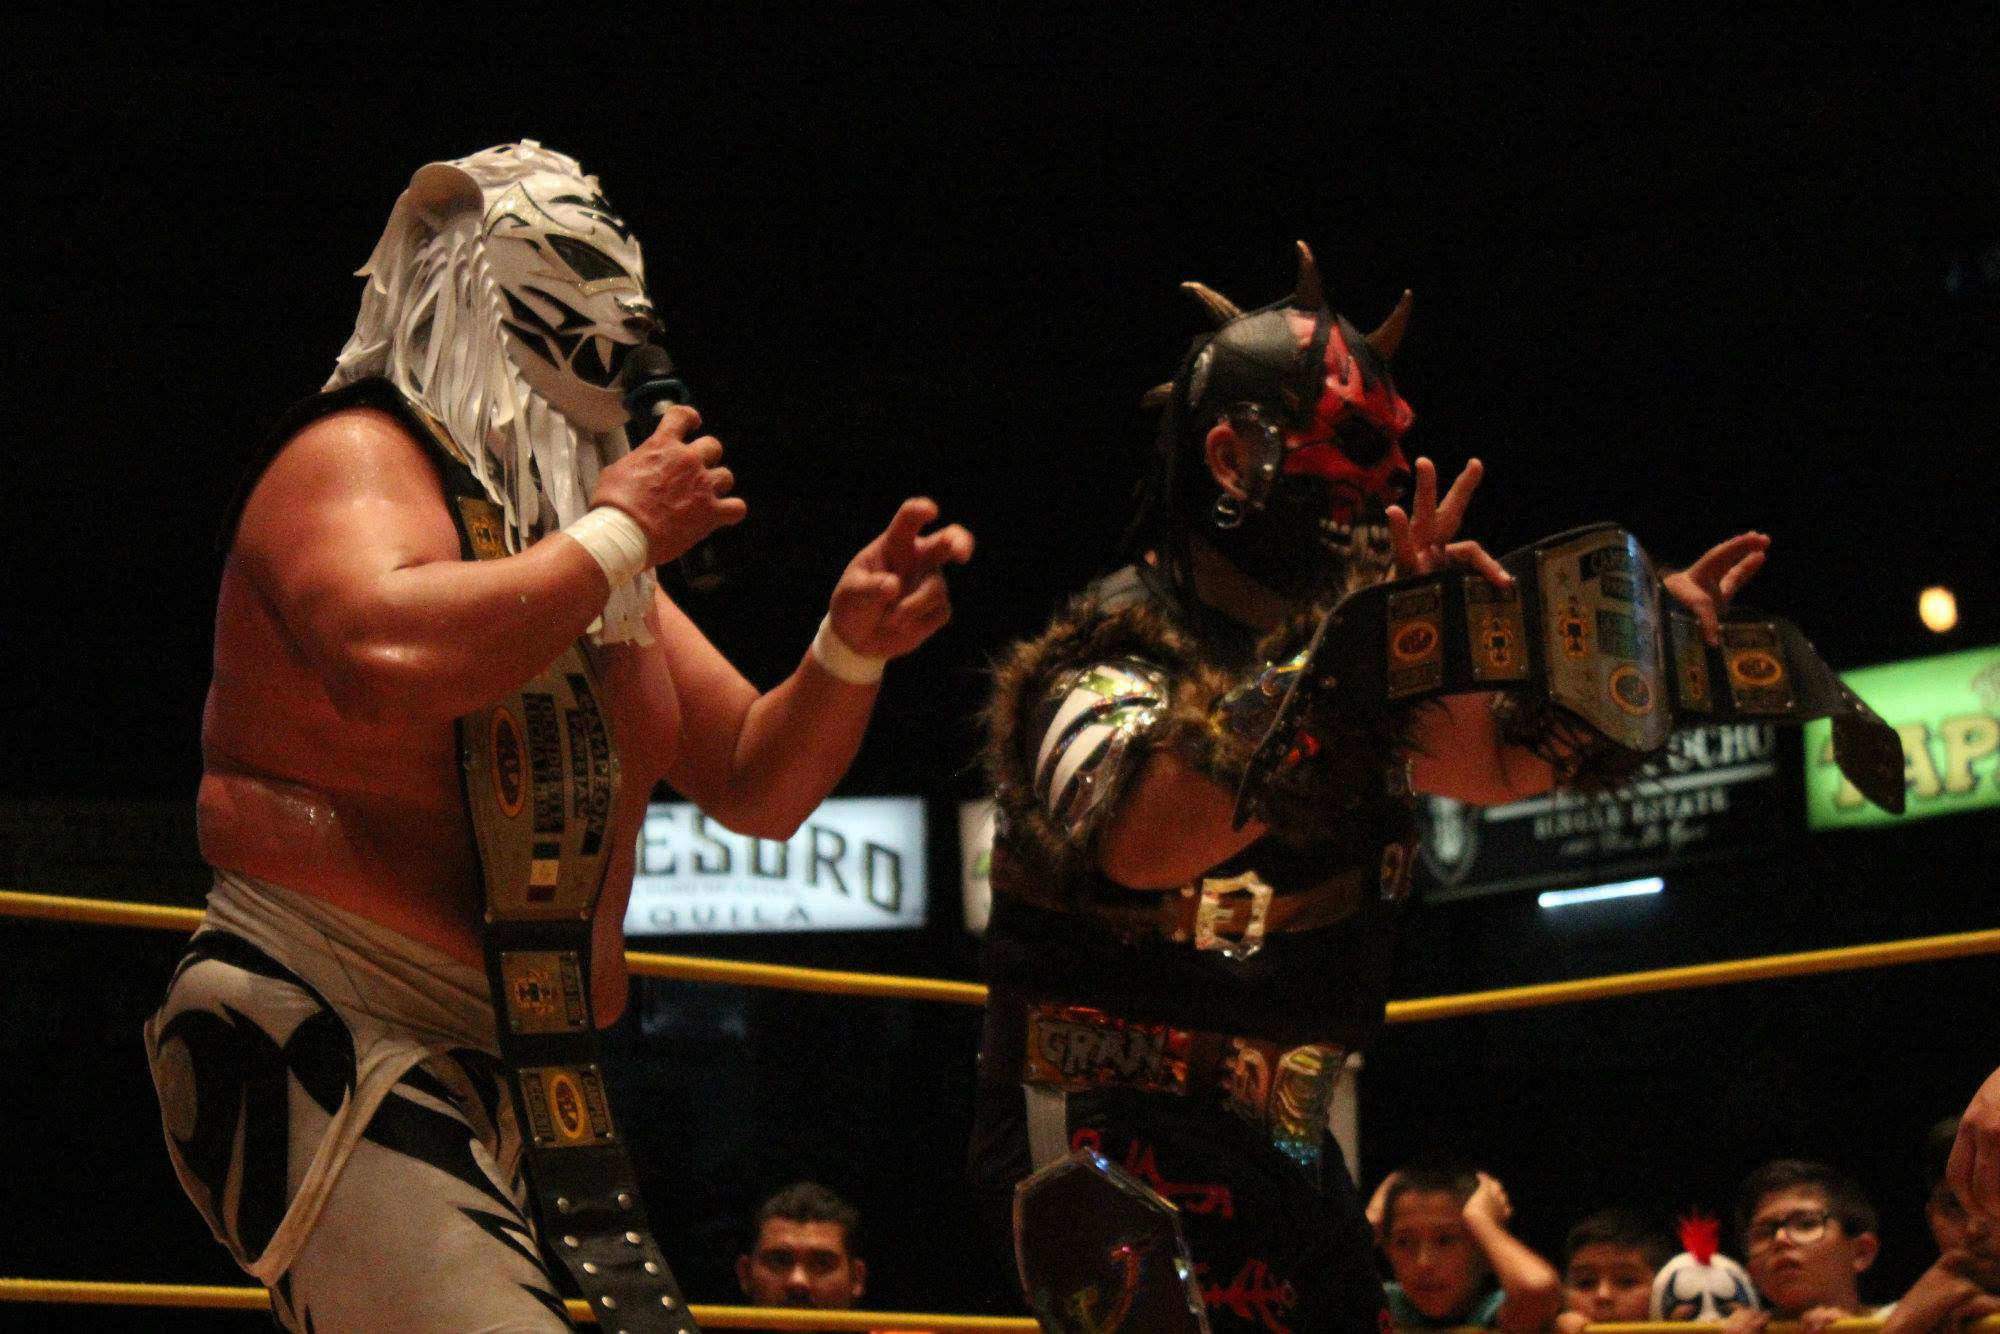 CMLL: Una mirada semanal al CMLL (Del 14 al 20 de marzo de 2019) 15